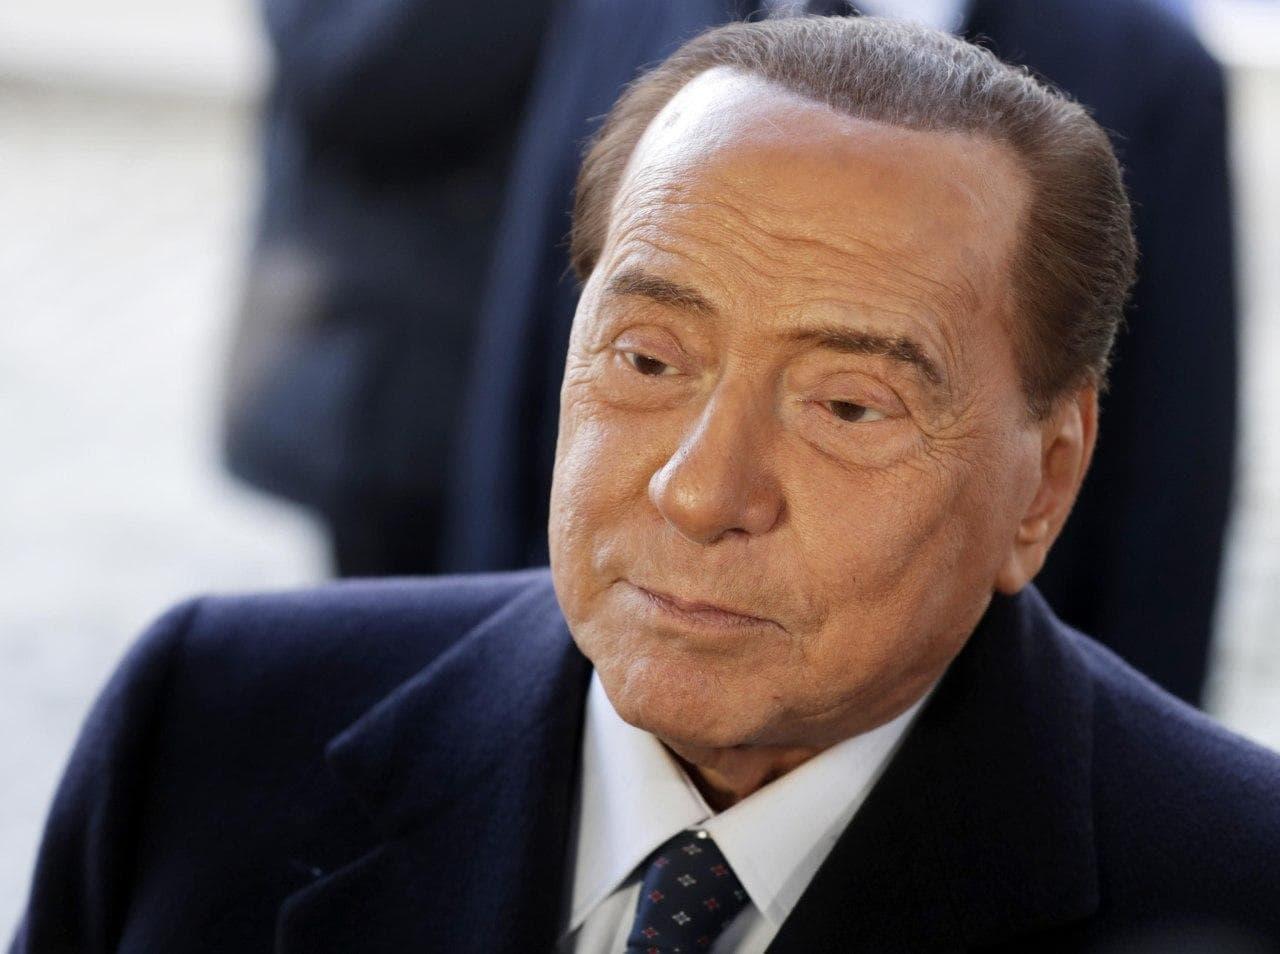 Coronavirus, compleanno in quarantena per Silvio Berlusconi